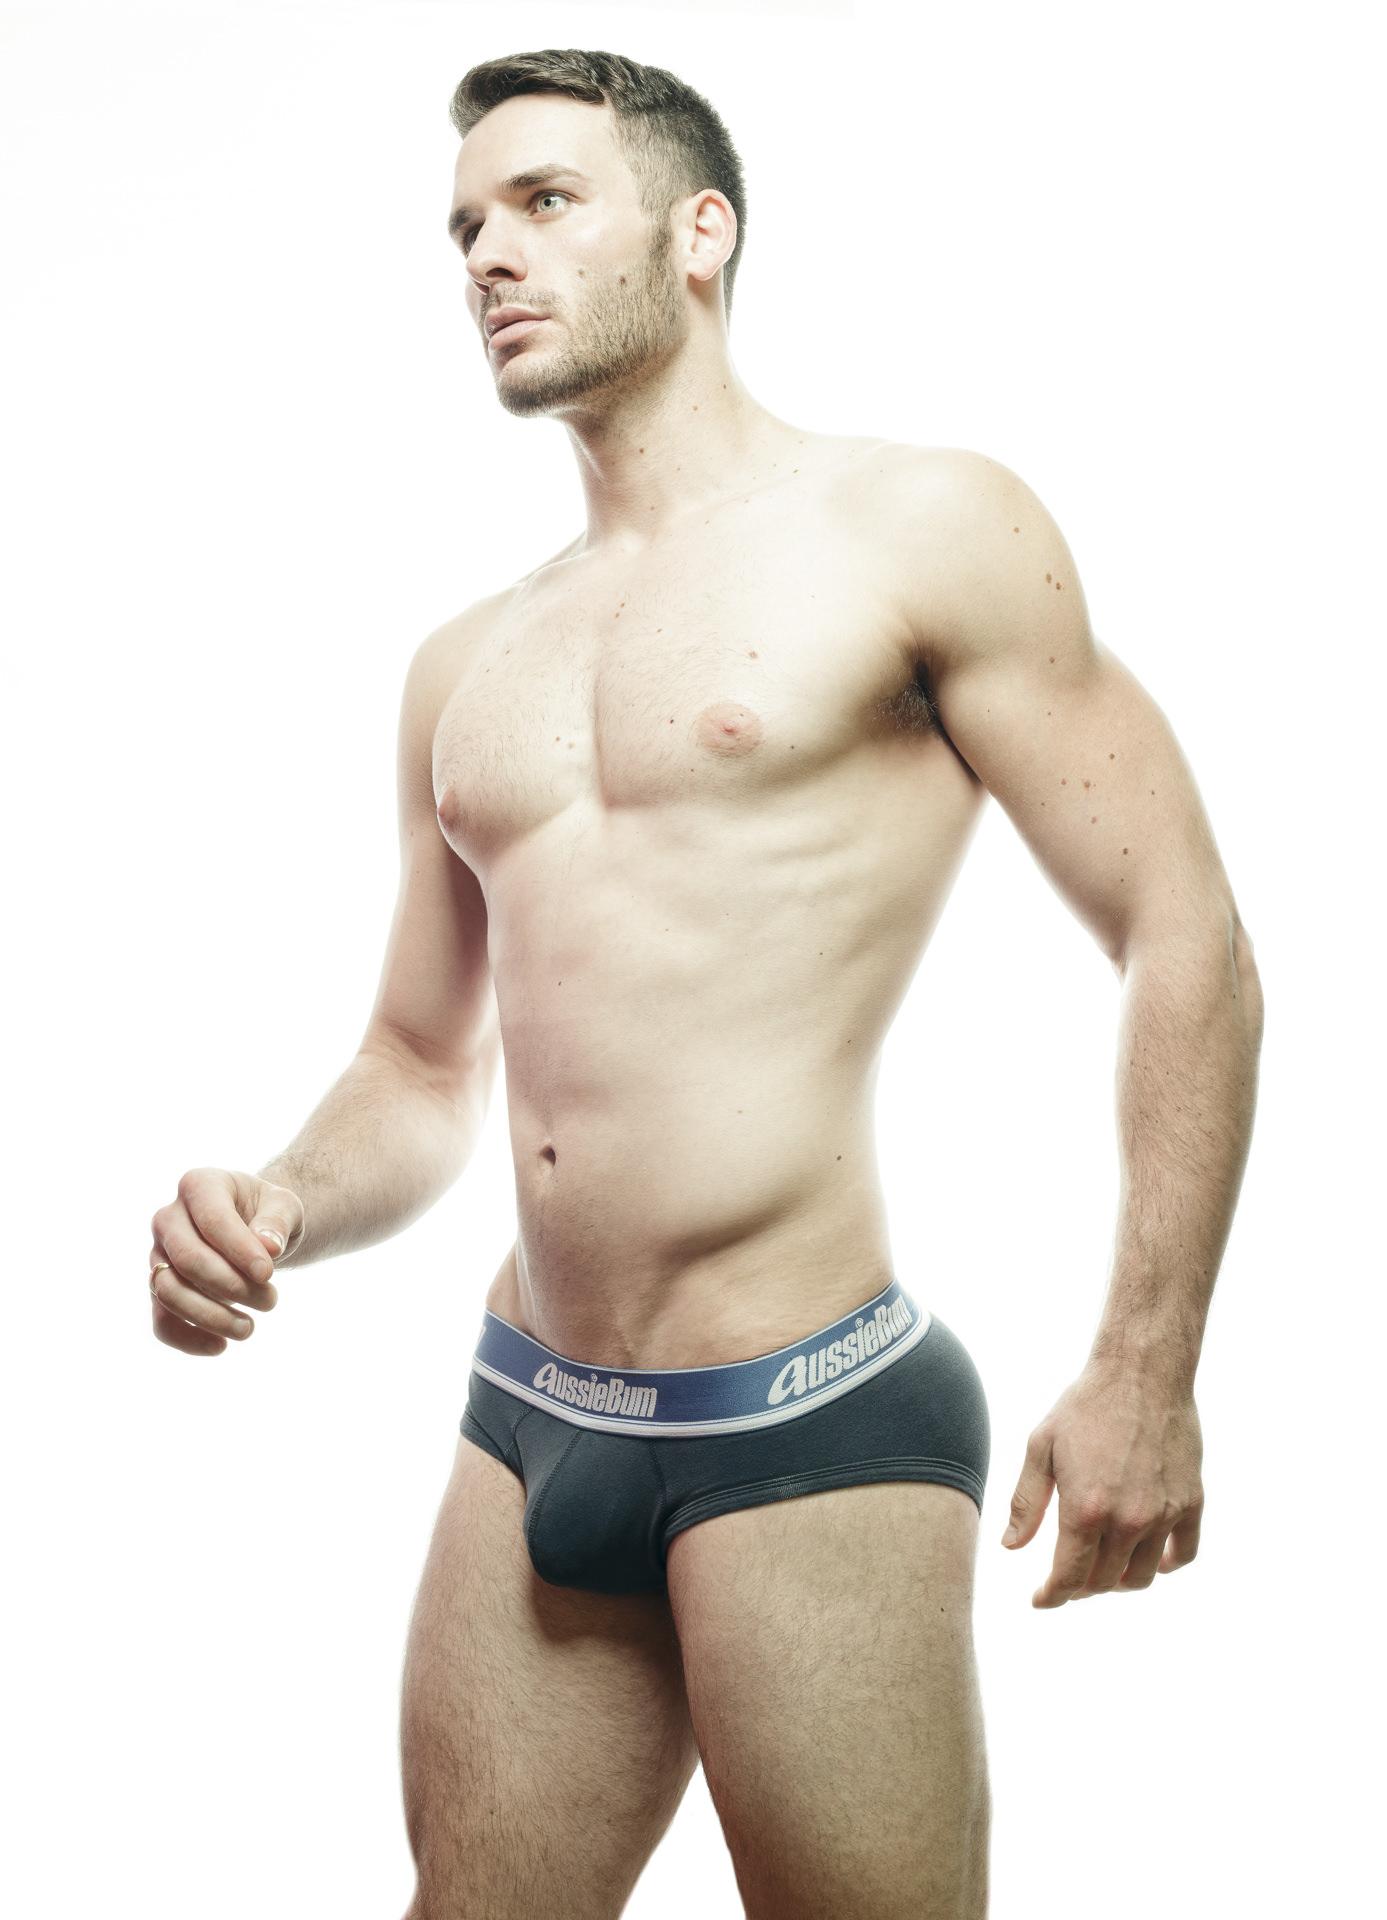 Up and Coming Model Profile - Matt Josbena